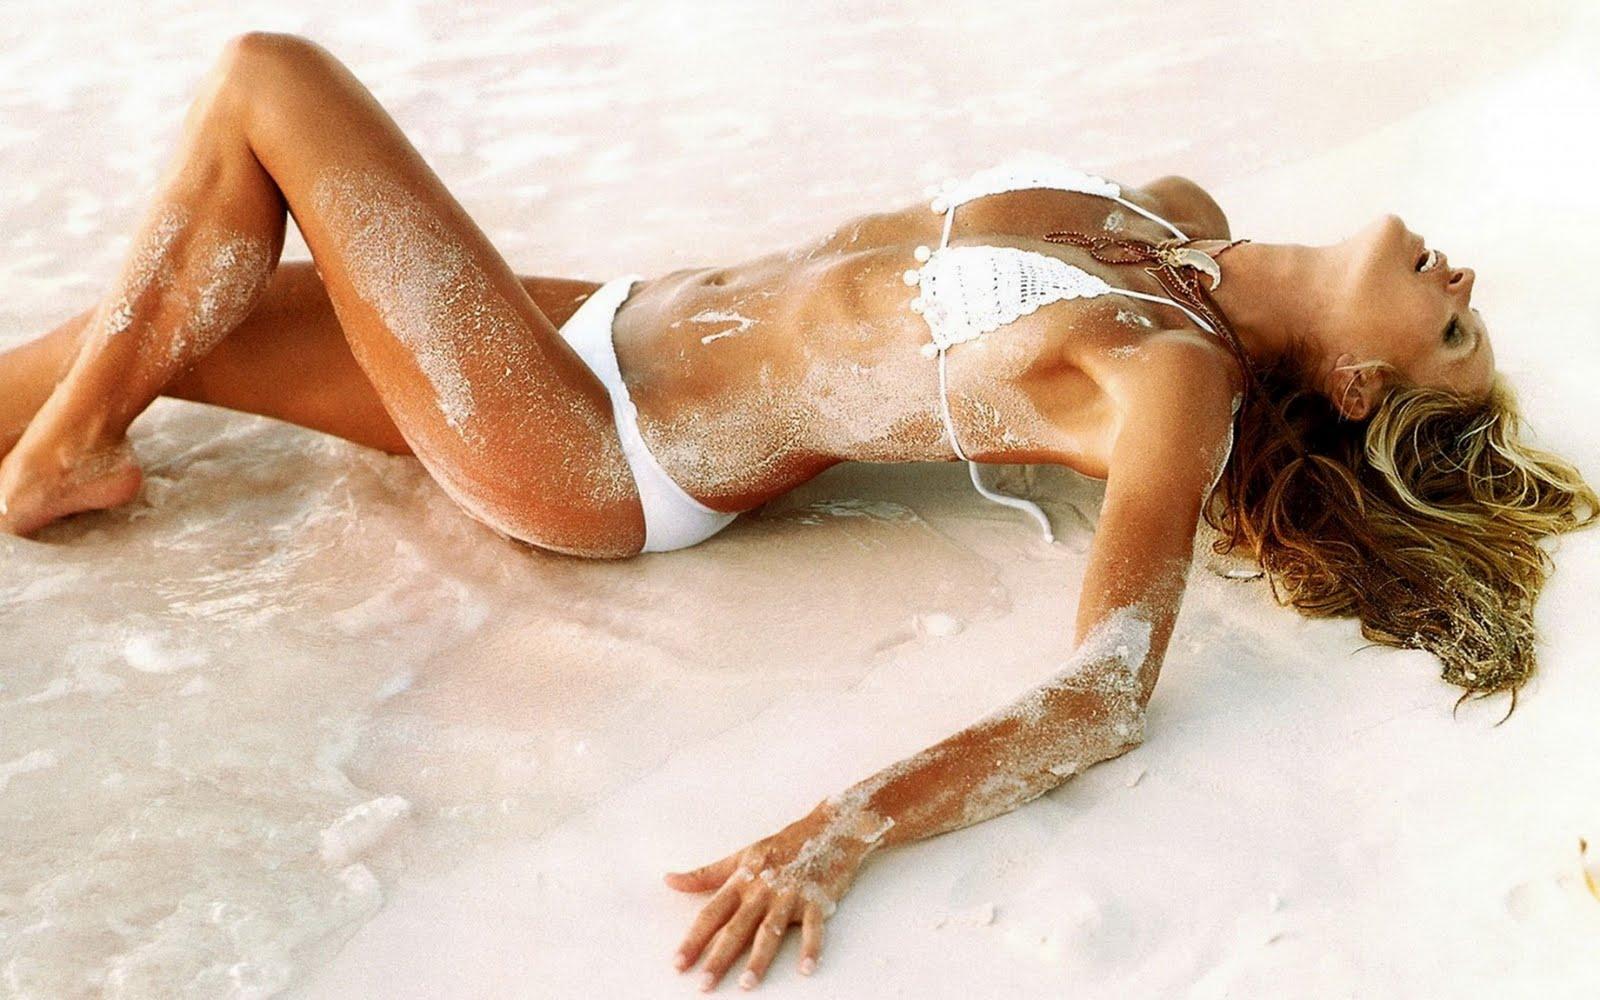 http://4.bp.blogspot.com/-OfjTstuD1Cc/TaiZQZEvEqI/AAAAAAAANbU/XaFBuvpeIvk/s1600/sexy-sunbathing-girl.jpg